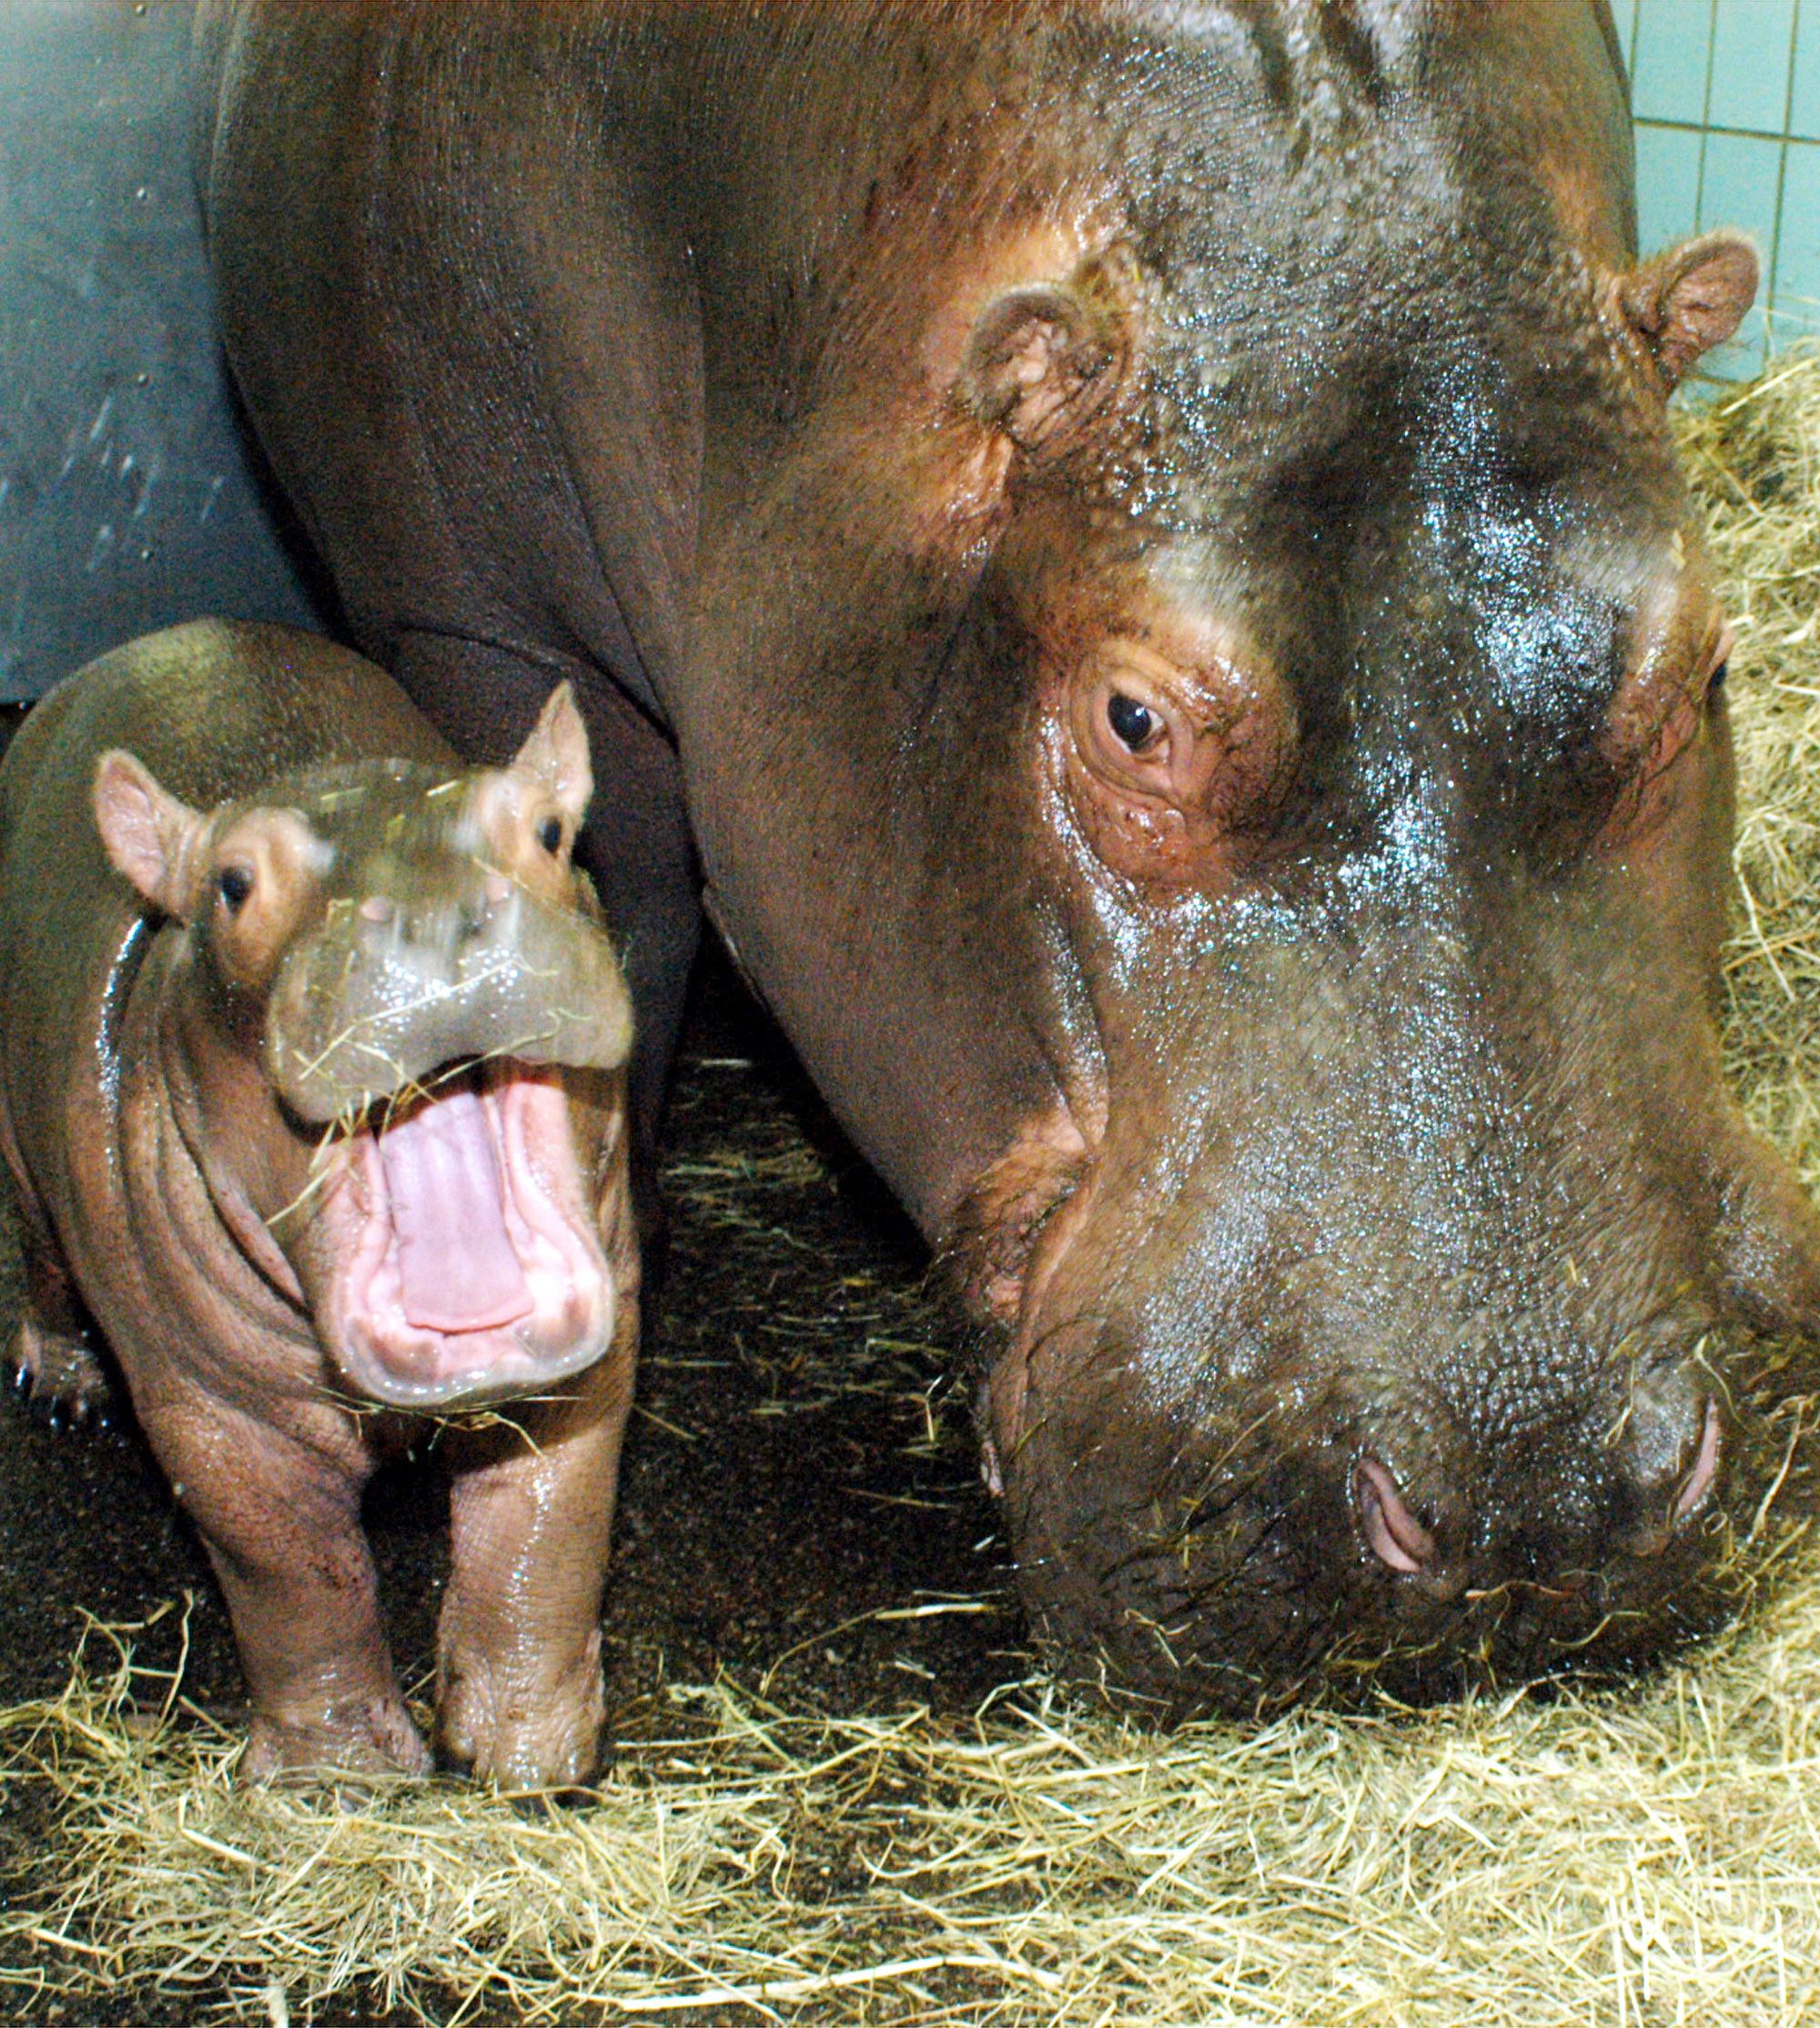 Hippotamus mother and offspring